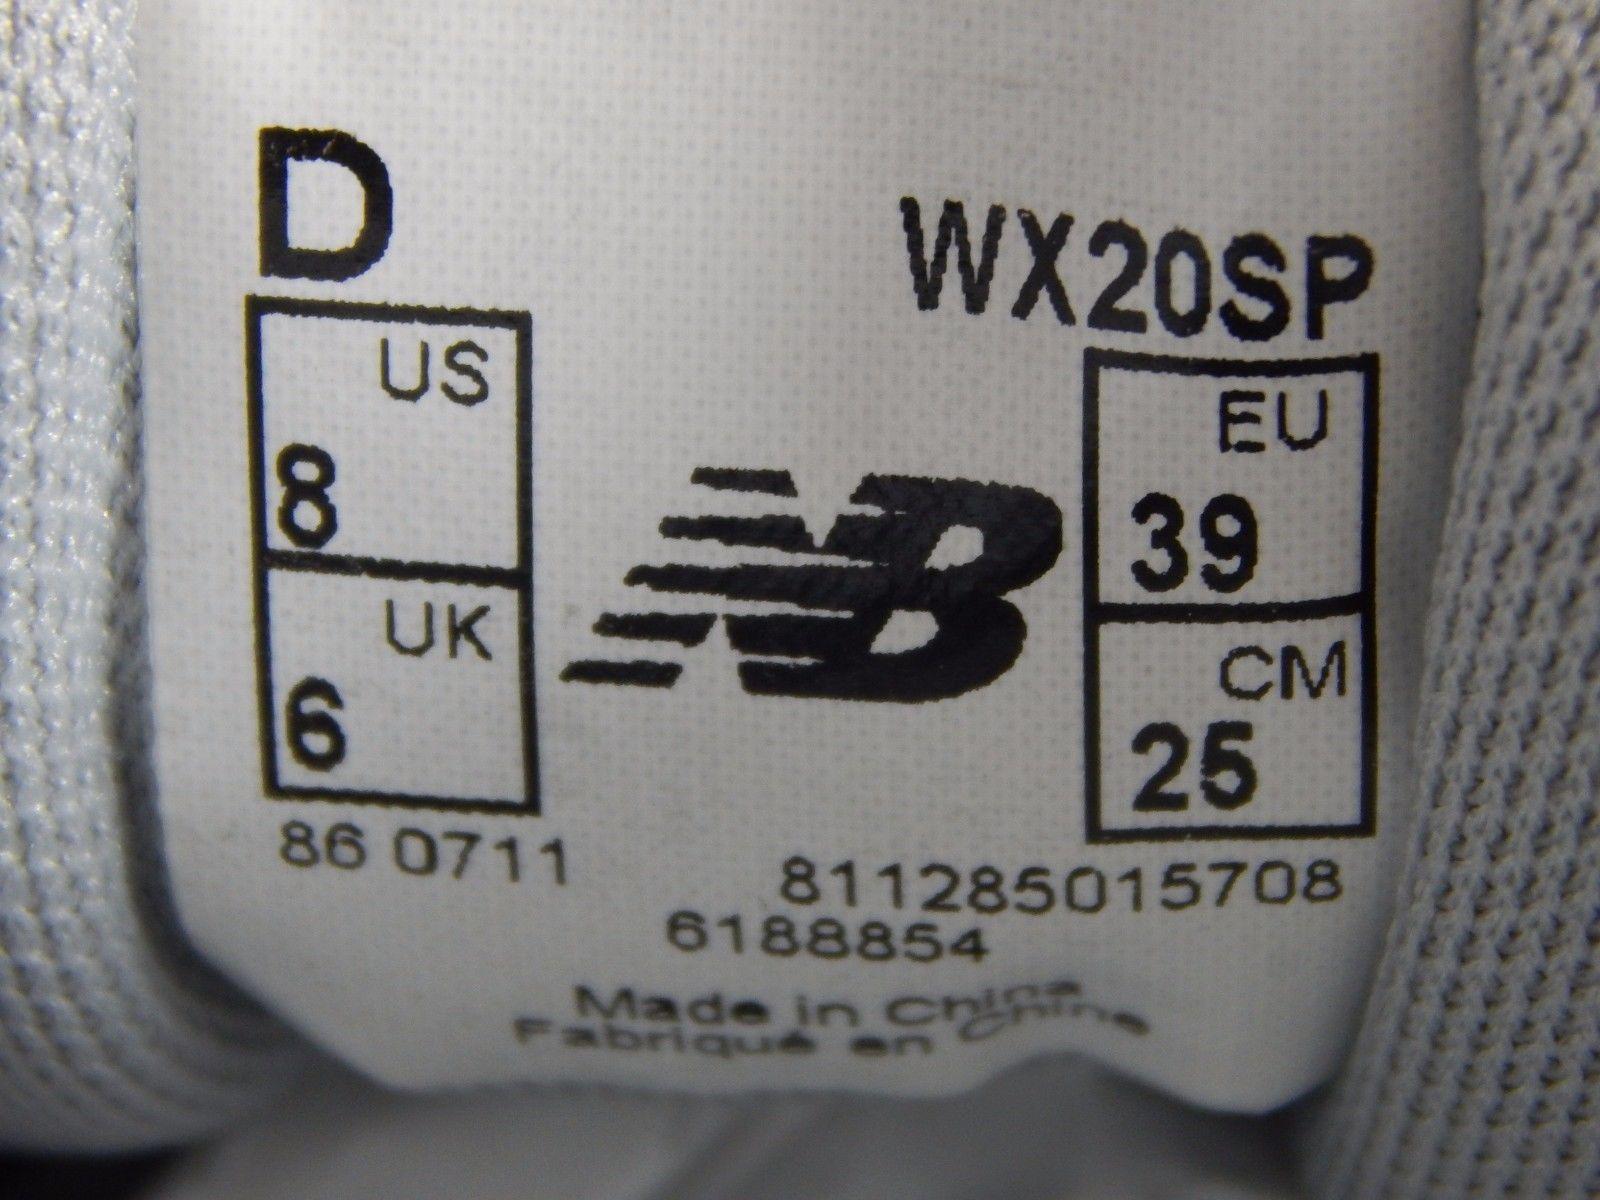 New Balance Minimus 20 Women's Cross Training Shoes Sz US 8 D WIDE EU 39 WX20SP